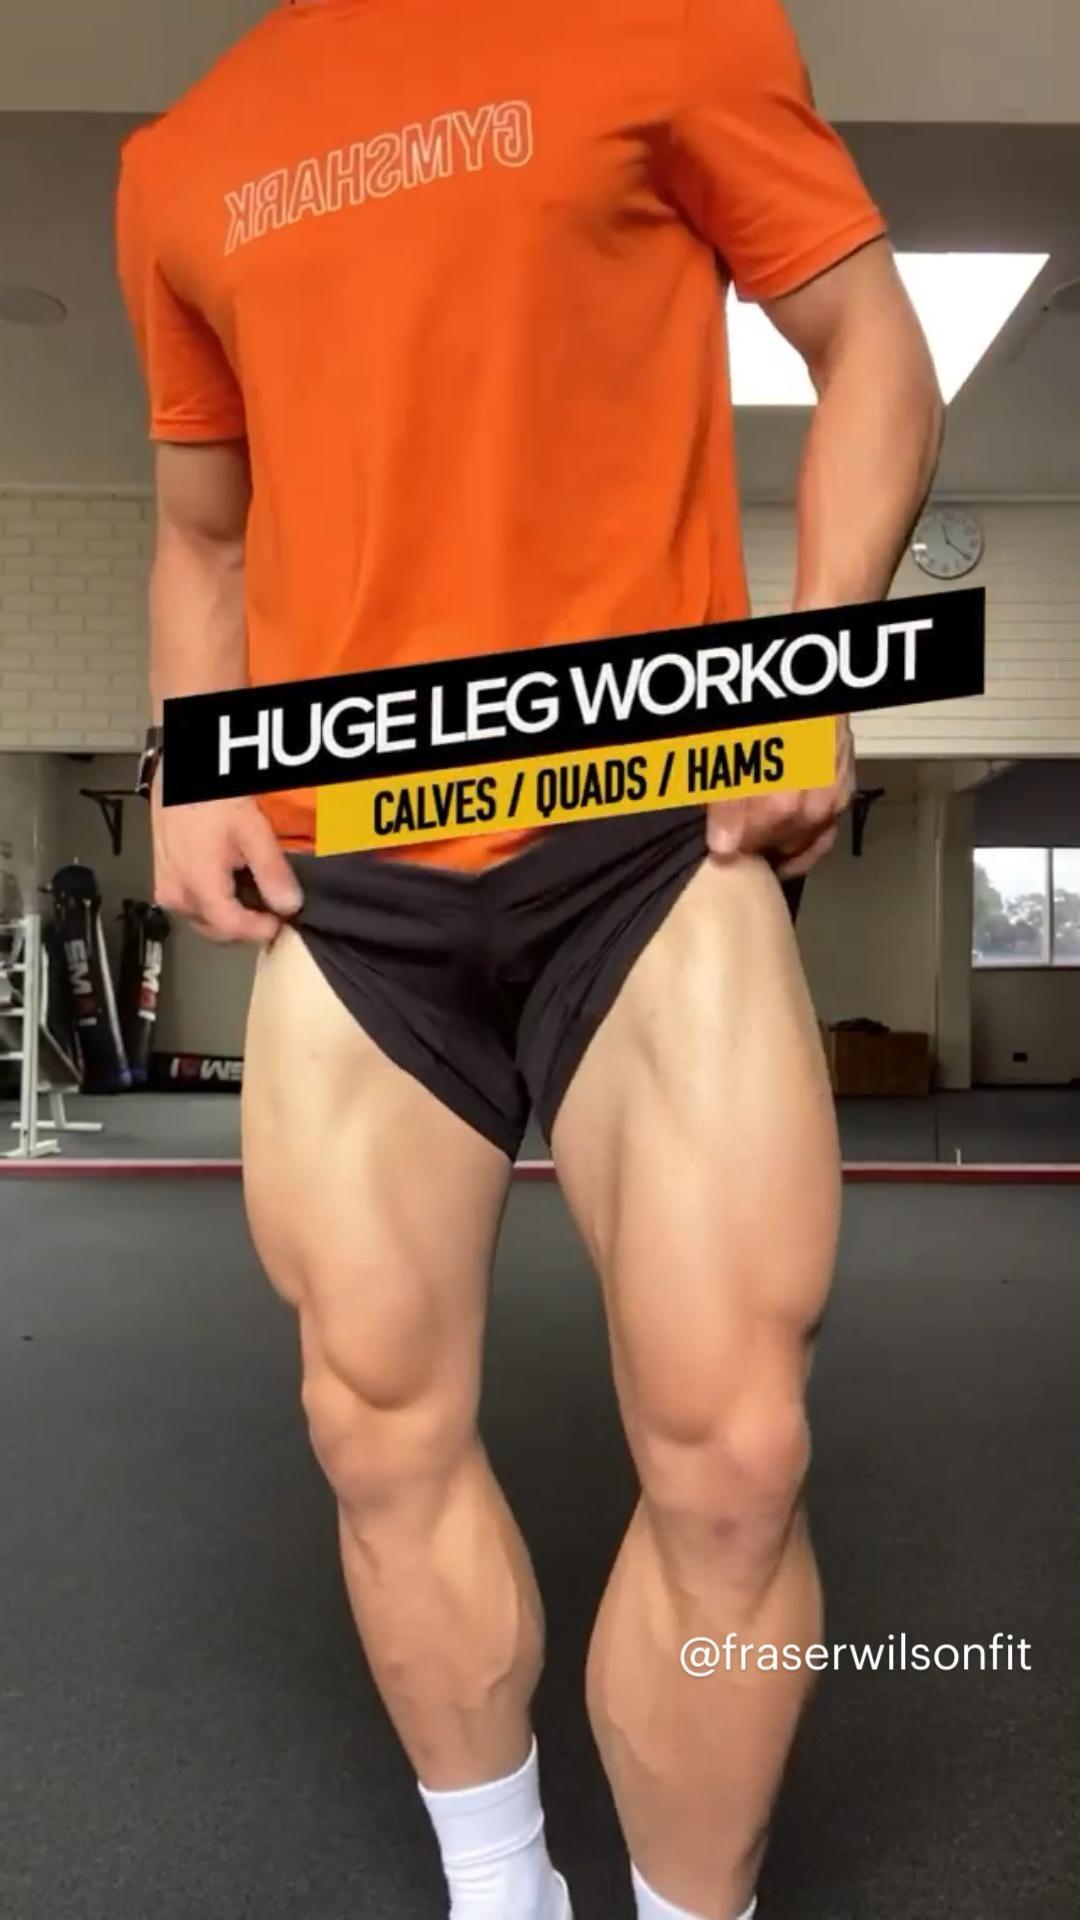 HUGE LEG WORKOUT